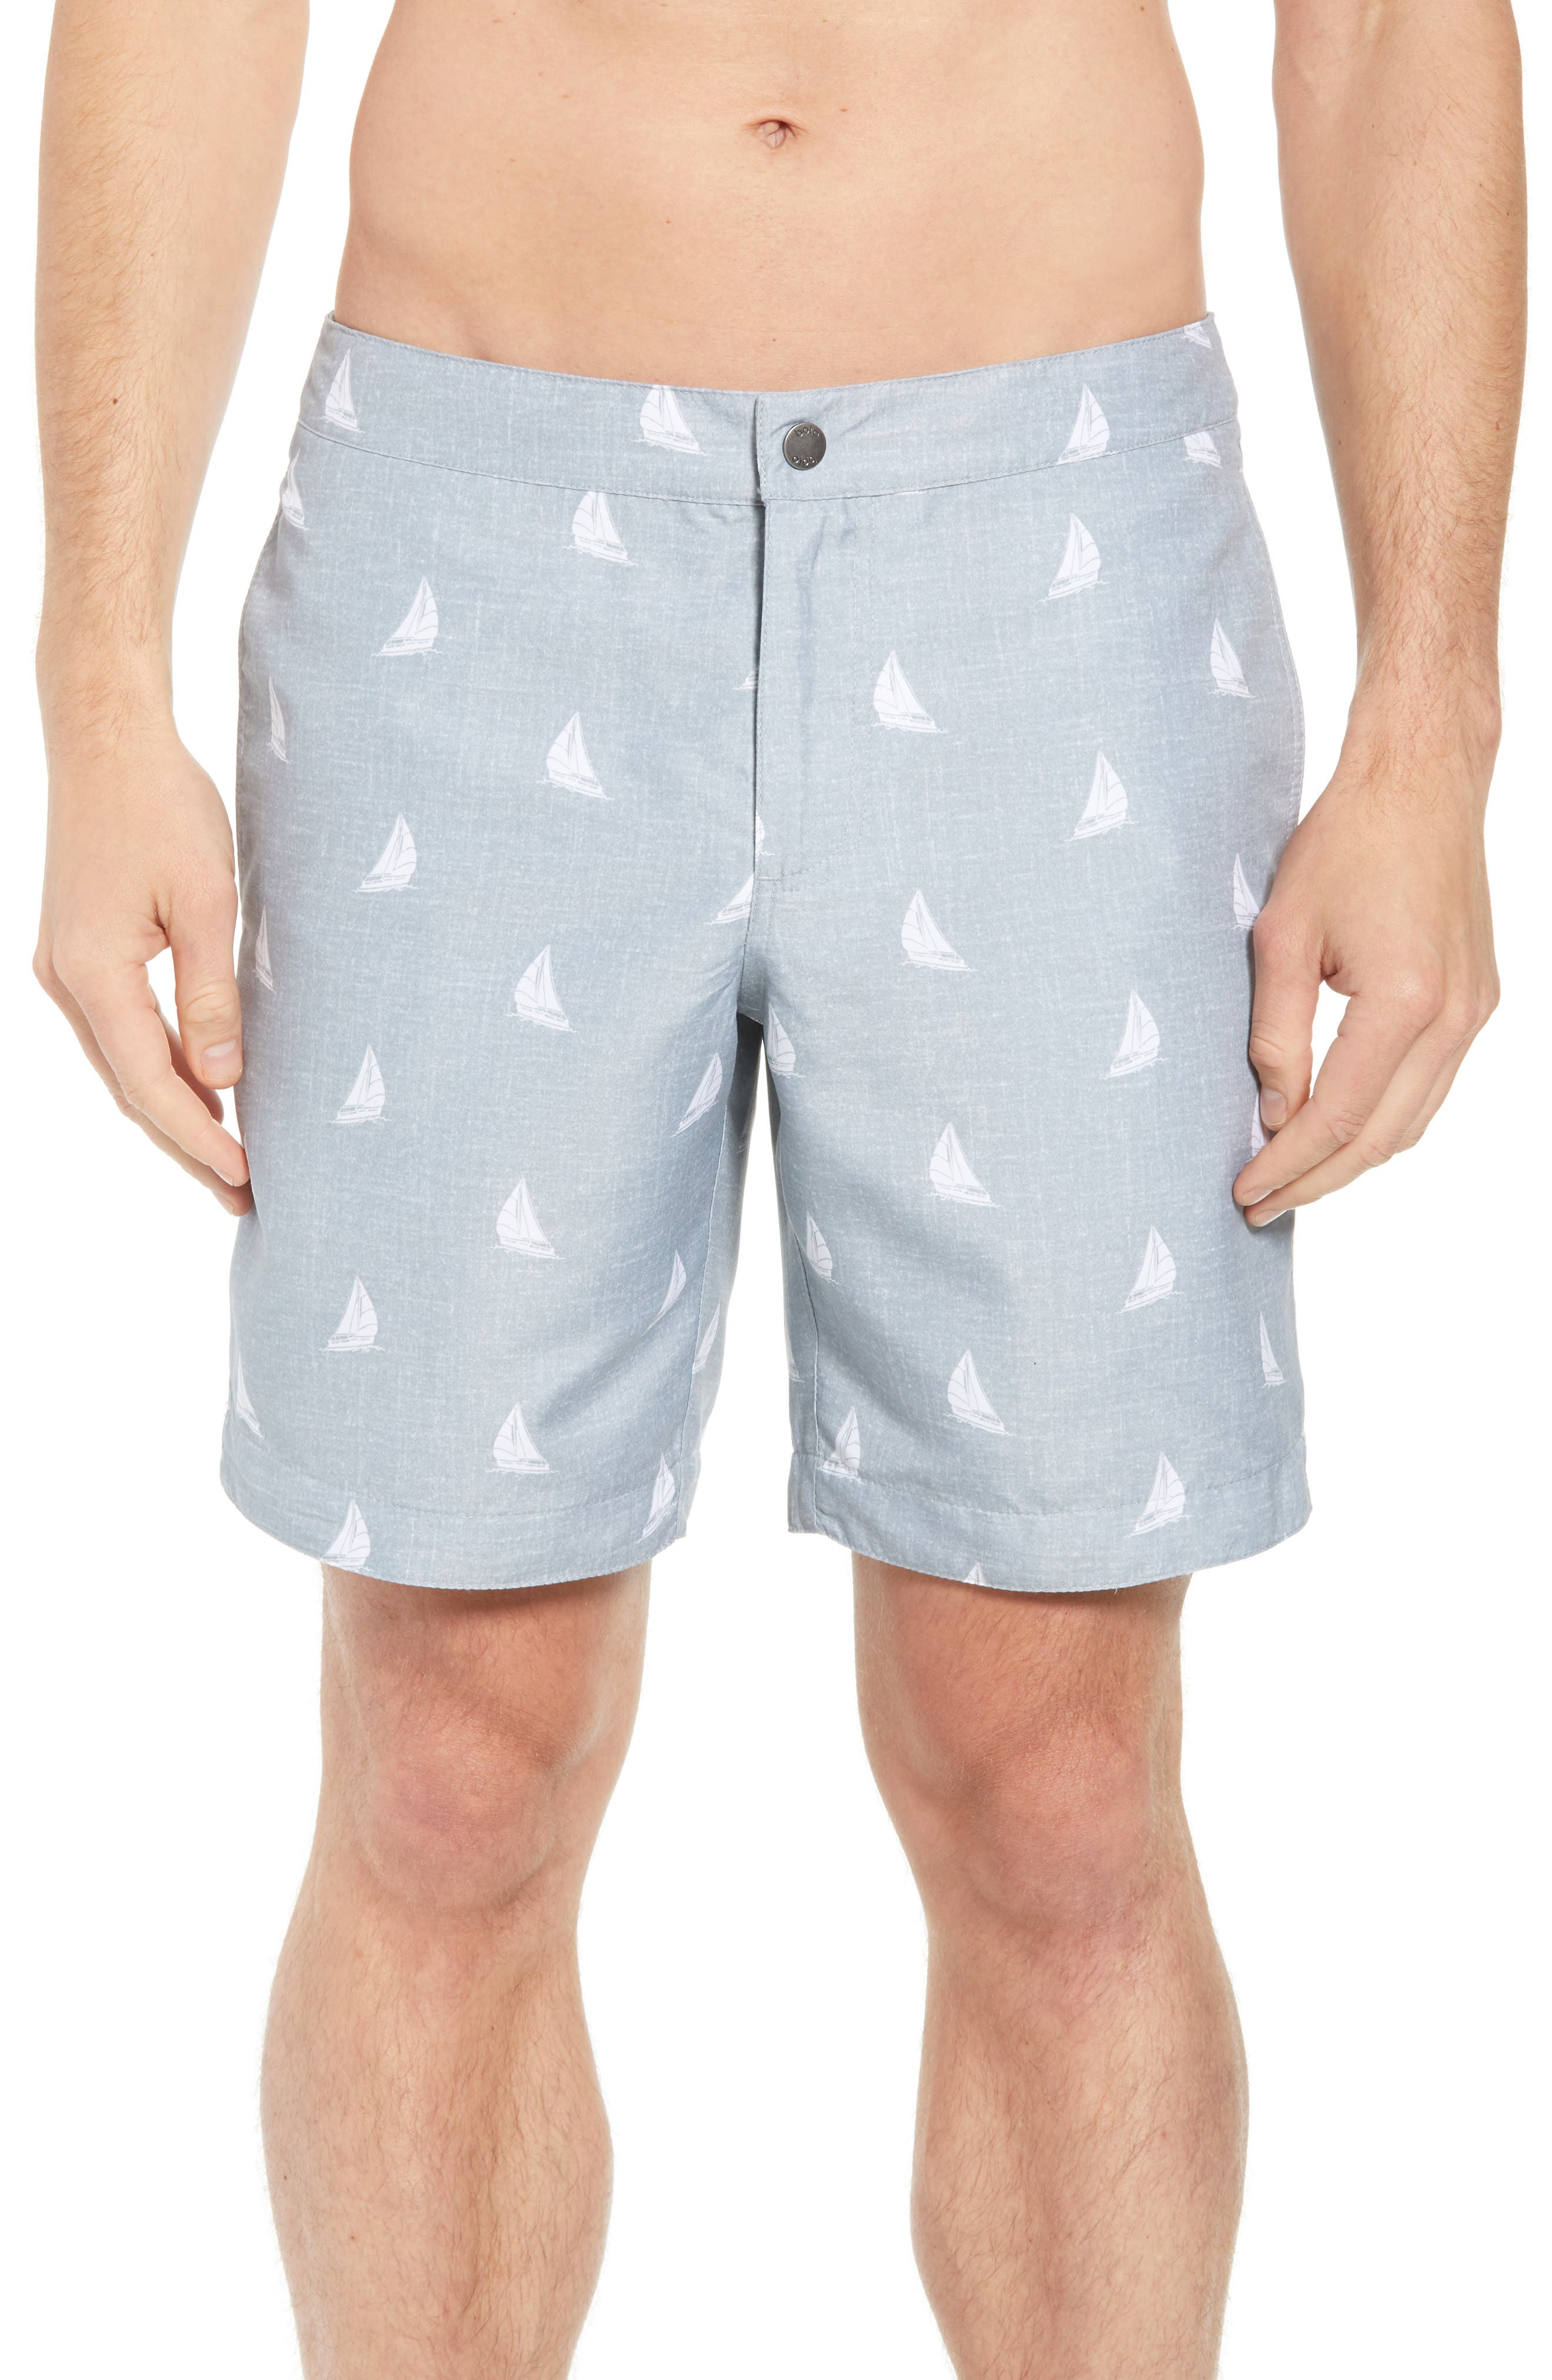 Aruba Slim Fit Swim Trunks,                         Main,                         color, Heathered Grey Sailboats